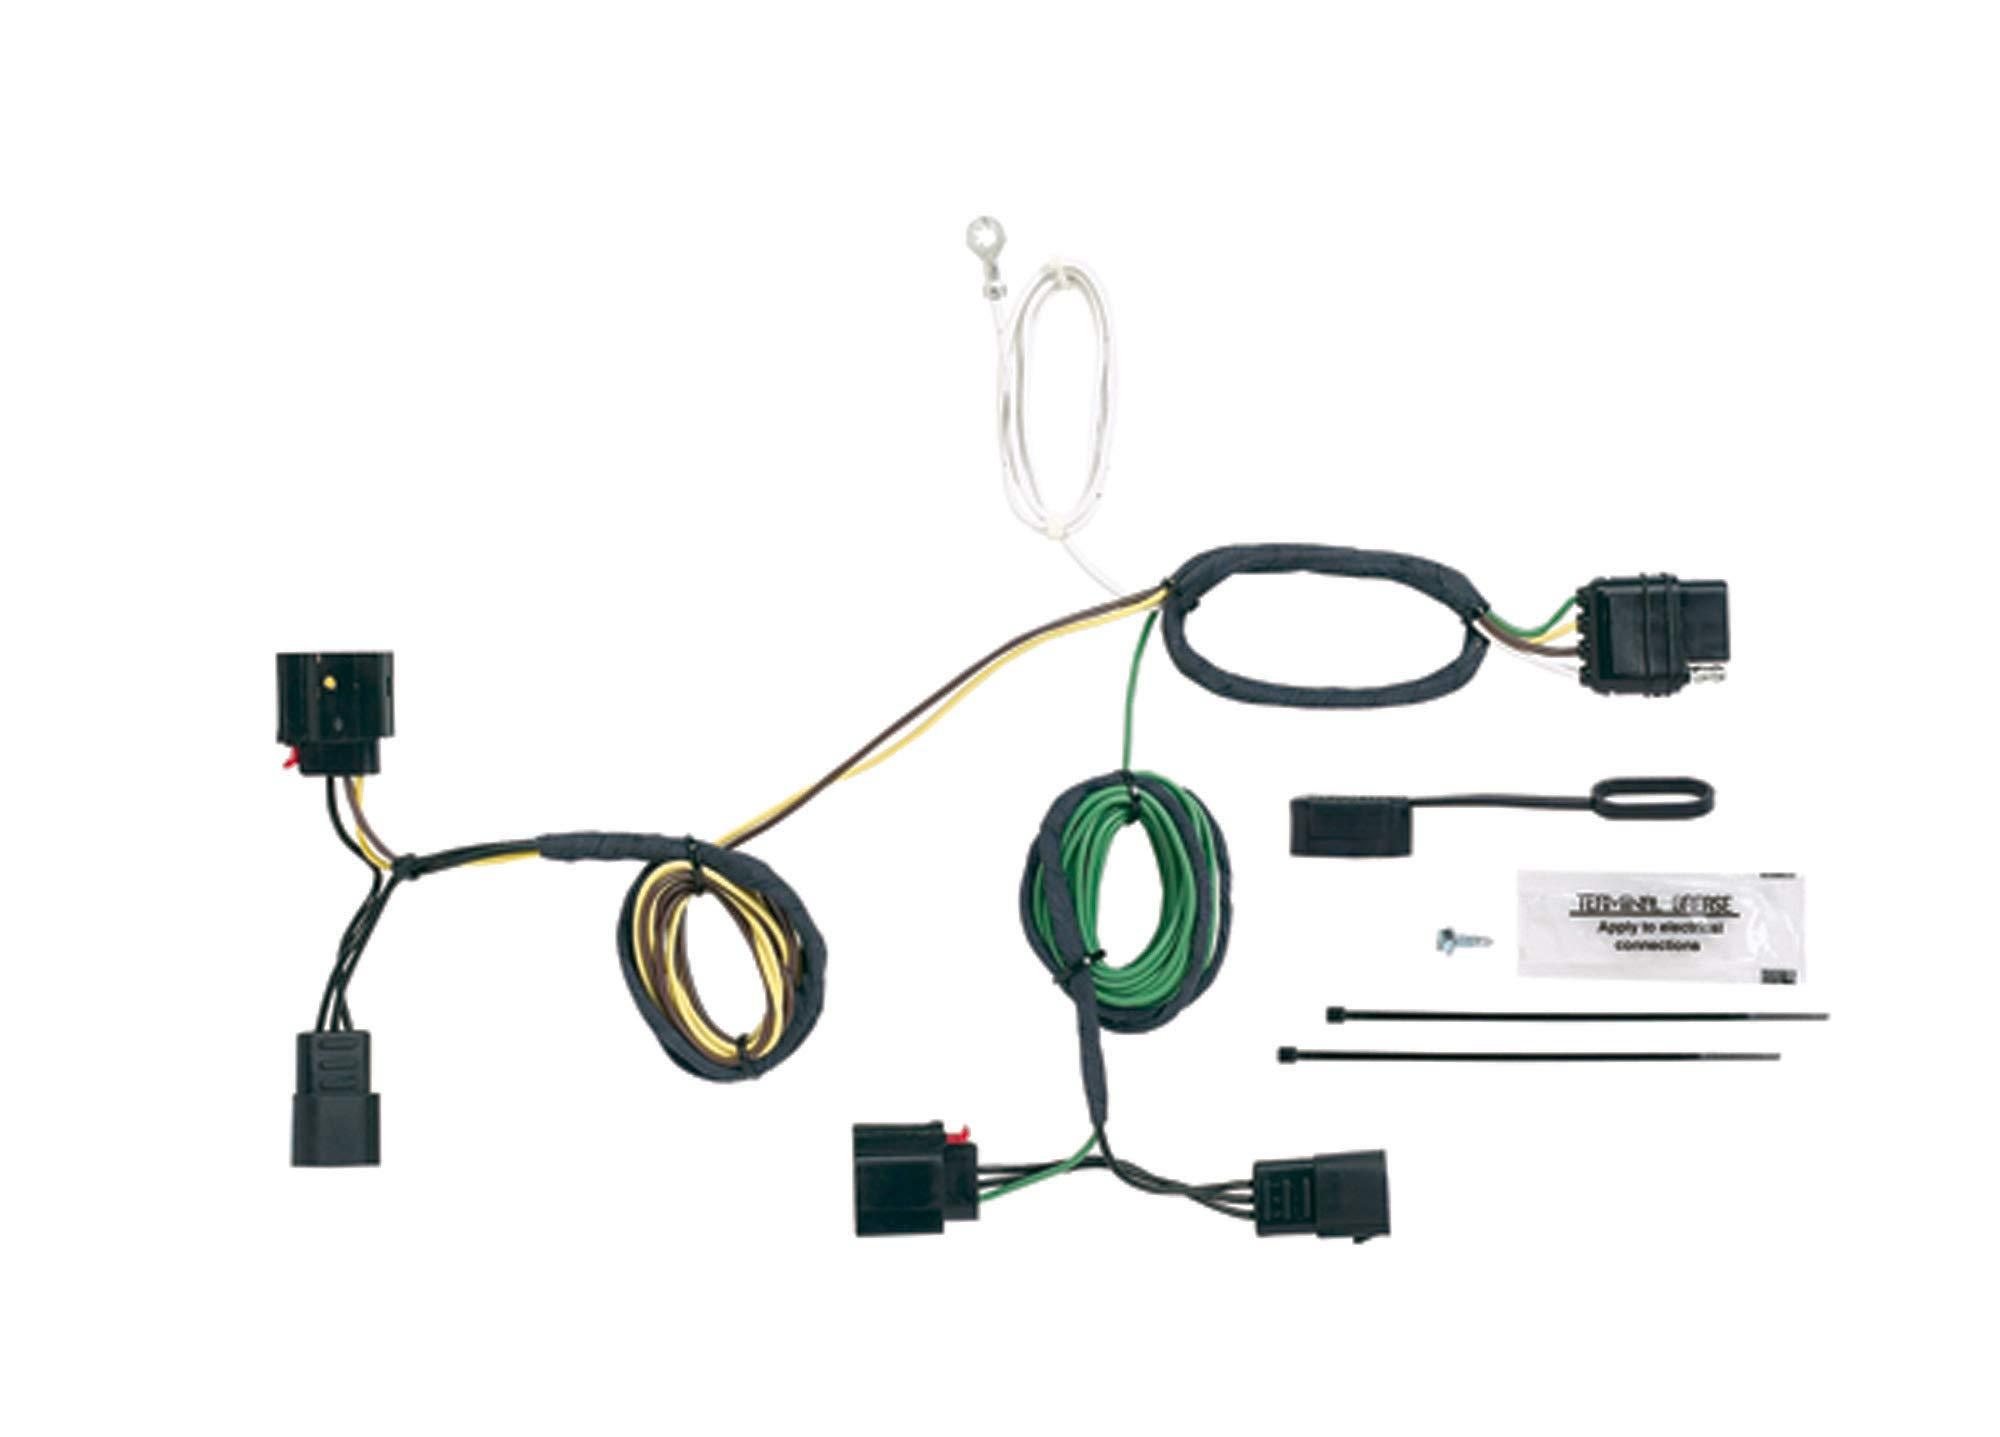 2015 Cherokee Hitch Wiring Diagram | Wiring Diagram on 1996 jeep cherokee wiring diagram, jeep cherokee rv wiring, 1998 jeep grand cherokee wiring diagram, 2000 jeep cherokee wiring diagram, 87 jeep cherokee wiring diagram, 1995 jeep cherokee wiring diagram, 1993 ford f-250 wiring diagram, 1991 jeep cherokee wiring diagram, jeep cherokee radio wiring diagram, 99 jeep grand cherokee wiring diagram, 1997 jeep cherokee wiring diagram, 89 jeep cherokee wiring diagram, 1989 jeep cherokee wiring diagram, 2001 jeep cherokee wiring diagram, jeep cherokee wiring harness, 2008 jeep grand cherokee wiring diagram, 98 jeep cherokee wiring diagram, 01 jeep grand cherokee wiring diagram, jeep cherokee trailer plug, 2008 ford escape radio wiring diagram,